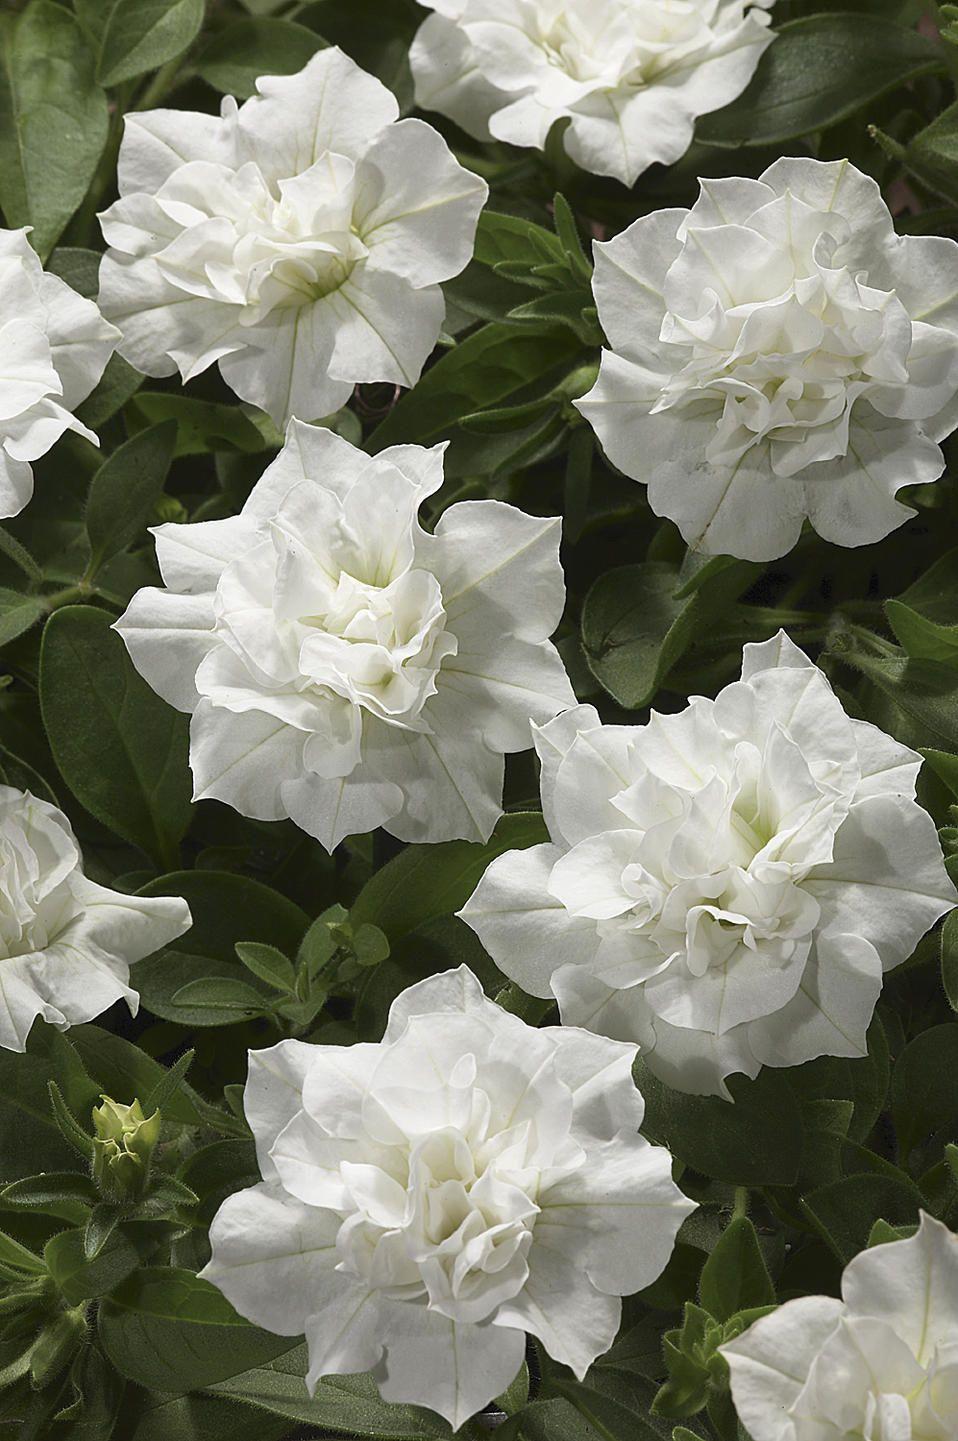 Blanket Double White Petunia Petunia Flower Annual Flowers